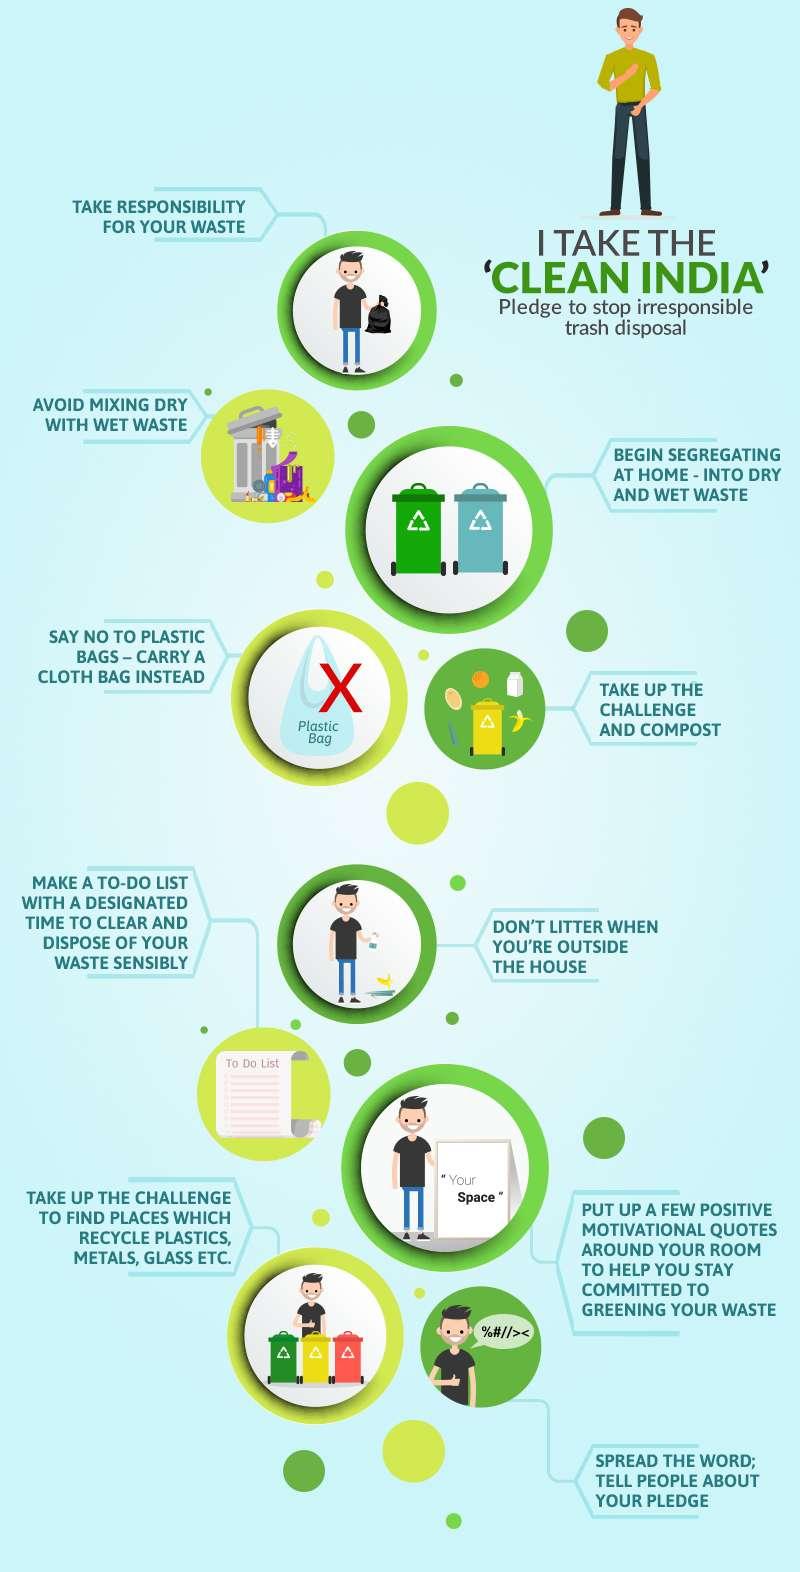 Take The Clean India Pledge To Stop Irresponsible Trash Disposal